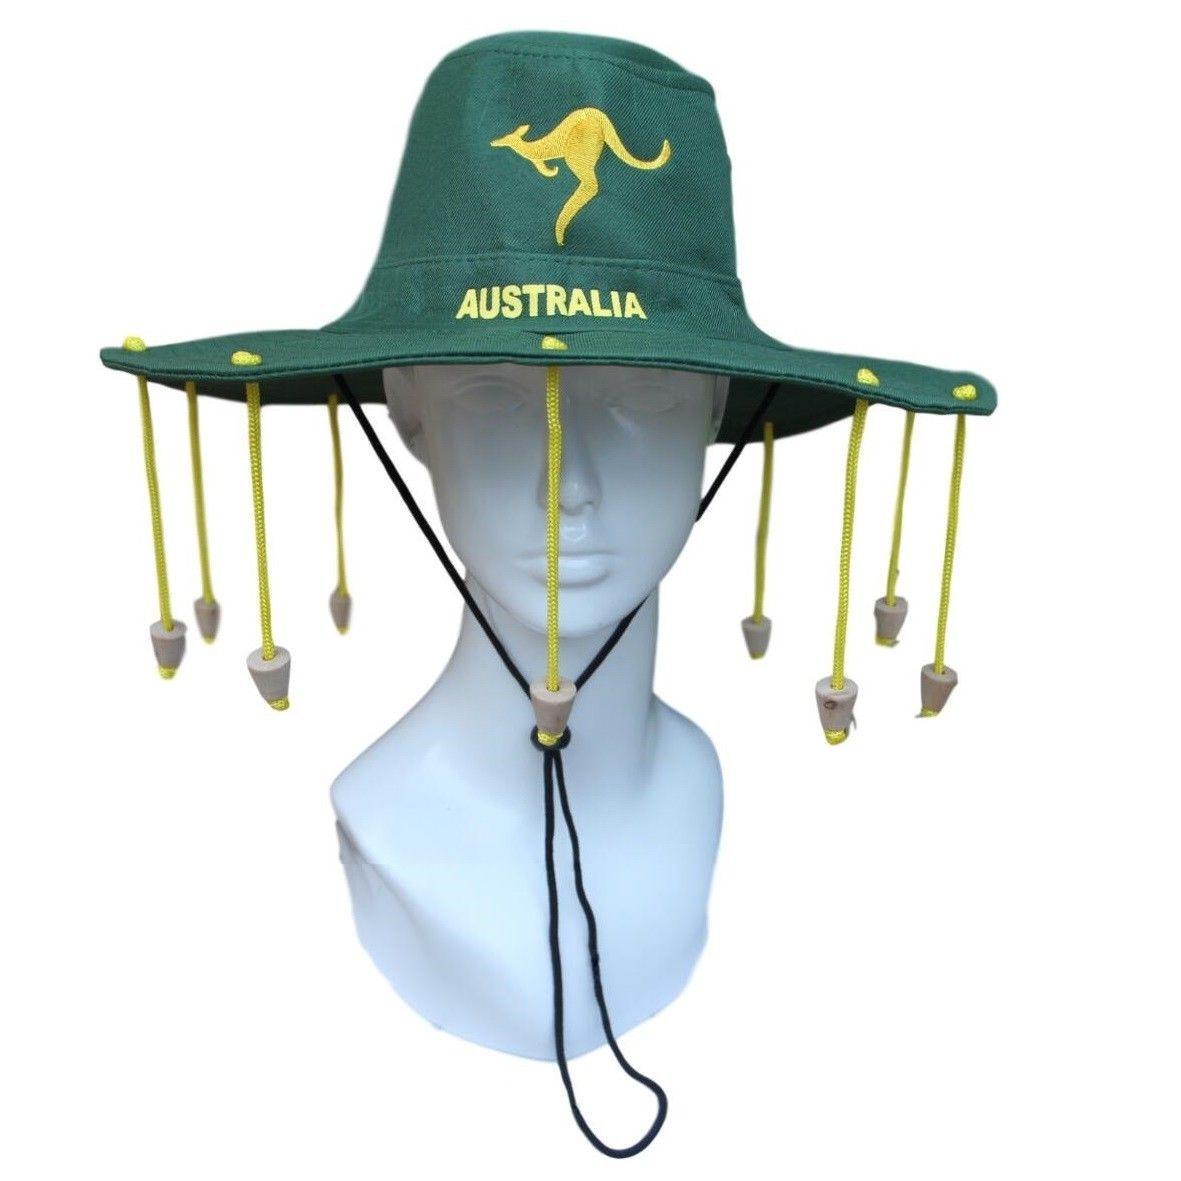 9e9bfed5c33 Aud aussie oz cork hat australian souvenir adult crocodile dundee costume  ebay fashion jpg 1181x1181 Aussie